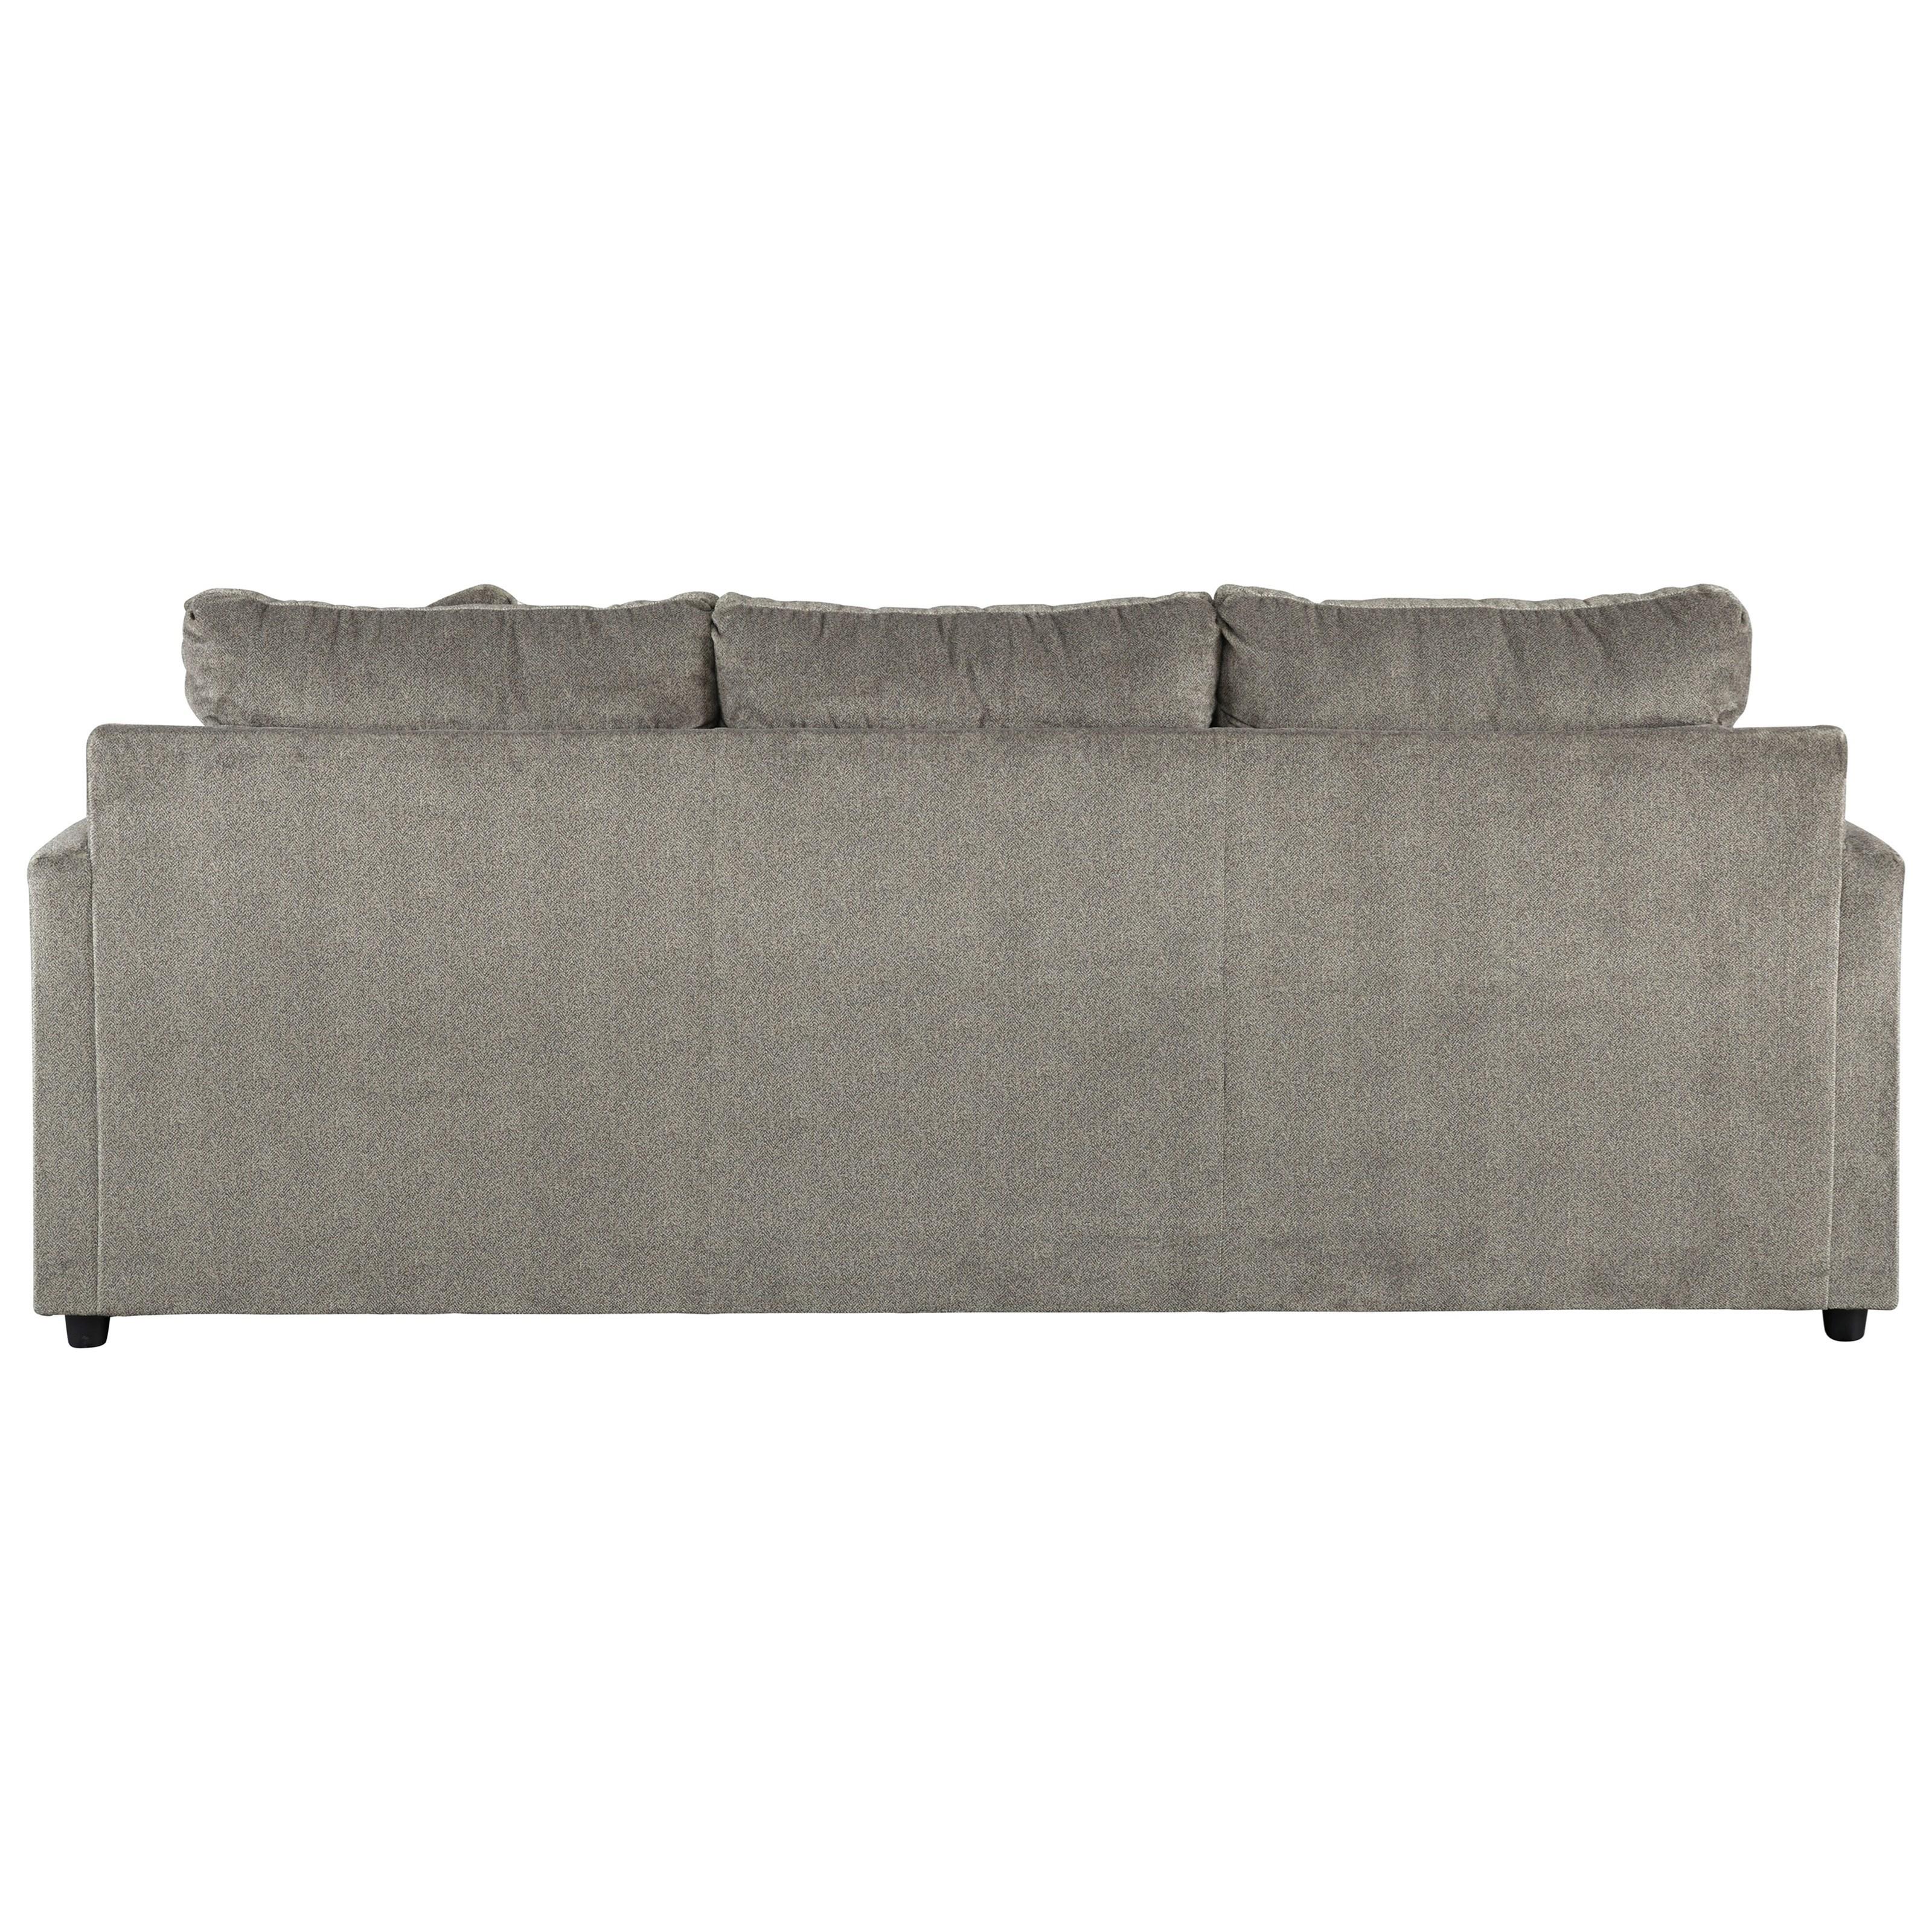 Ashley Furniture Manufacturer: Signature Design By Ashley Soletren Contemporary Sofa